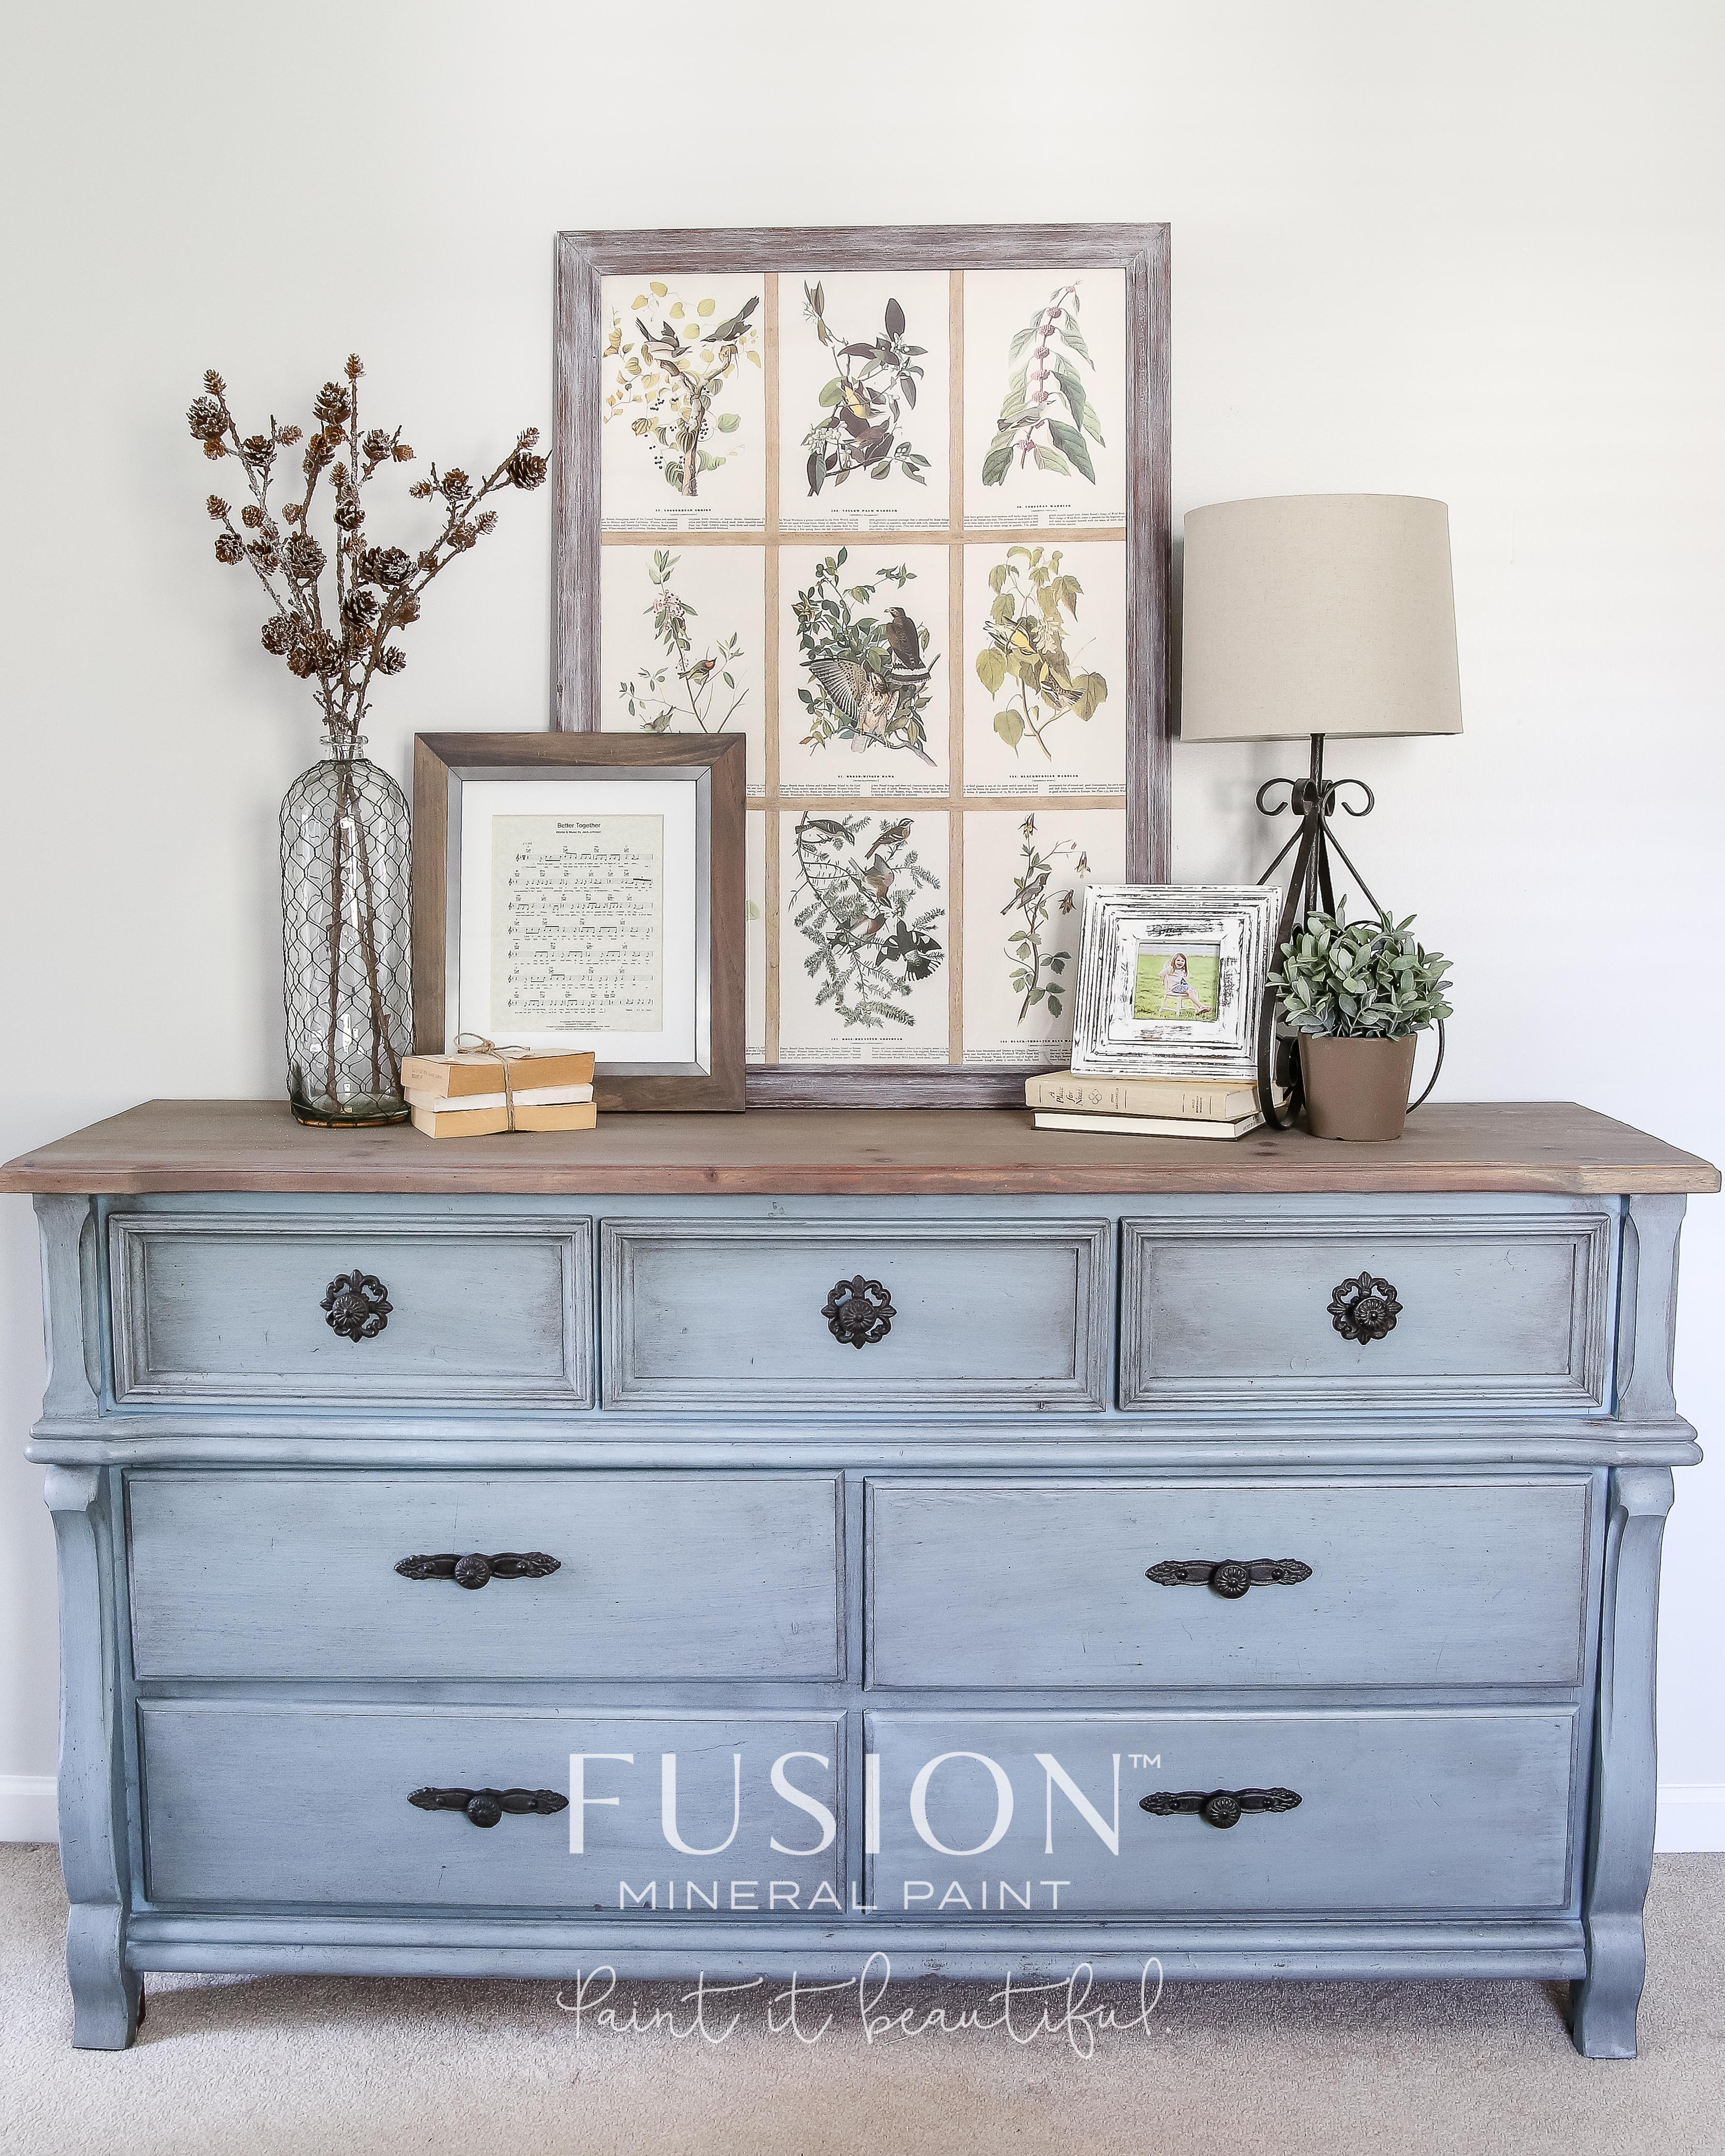 Furniture Painting 101